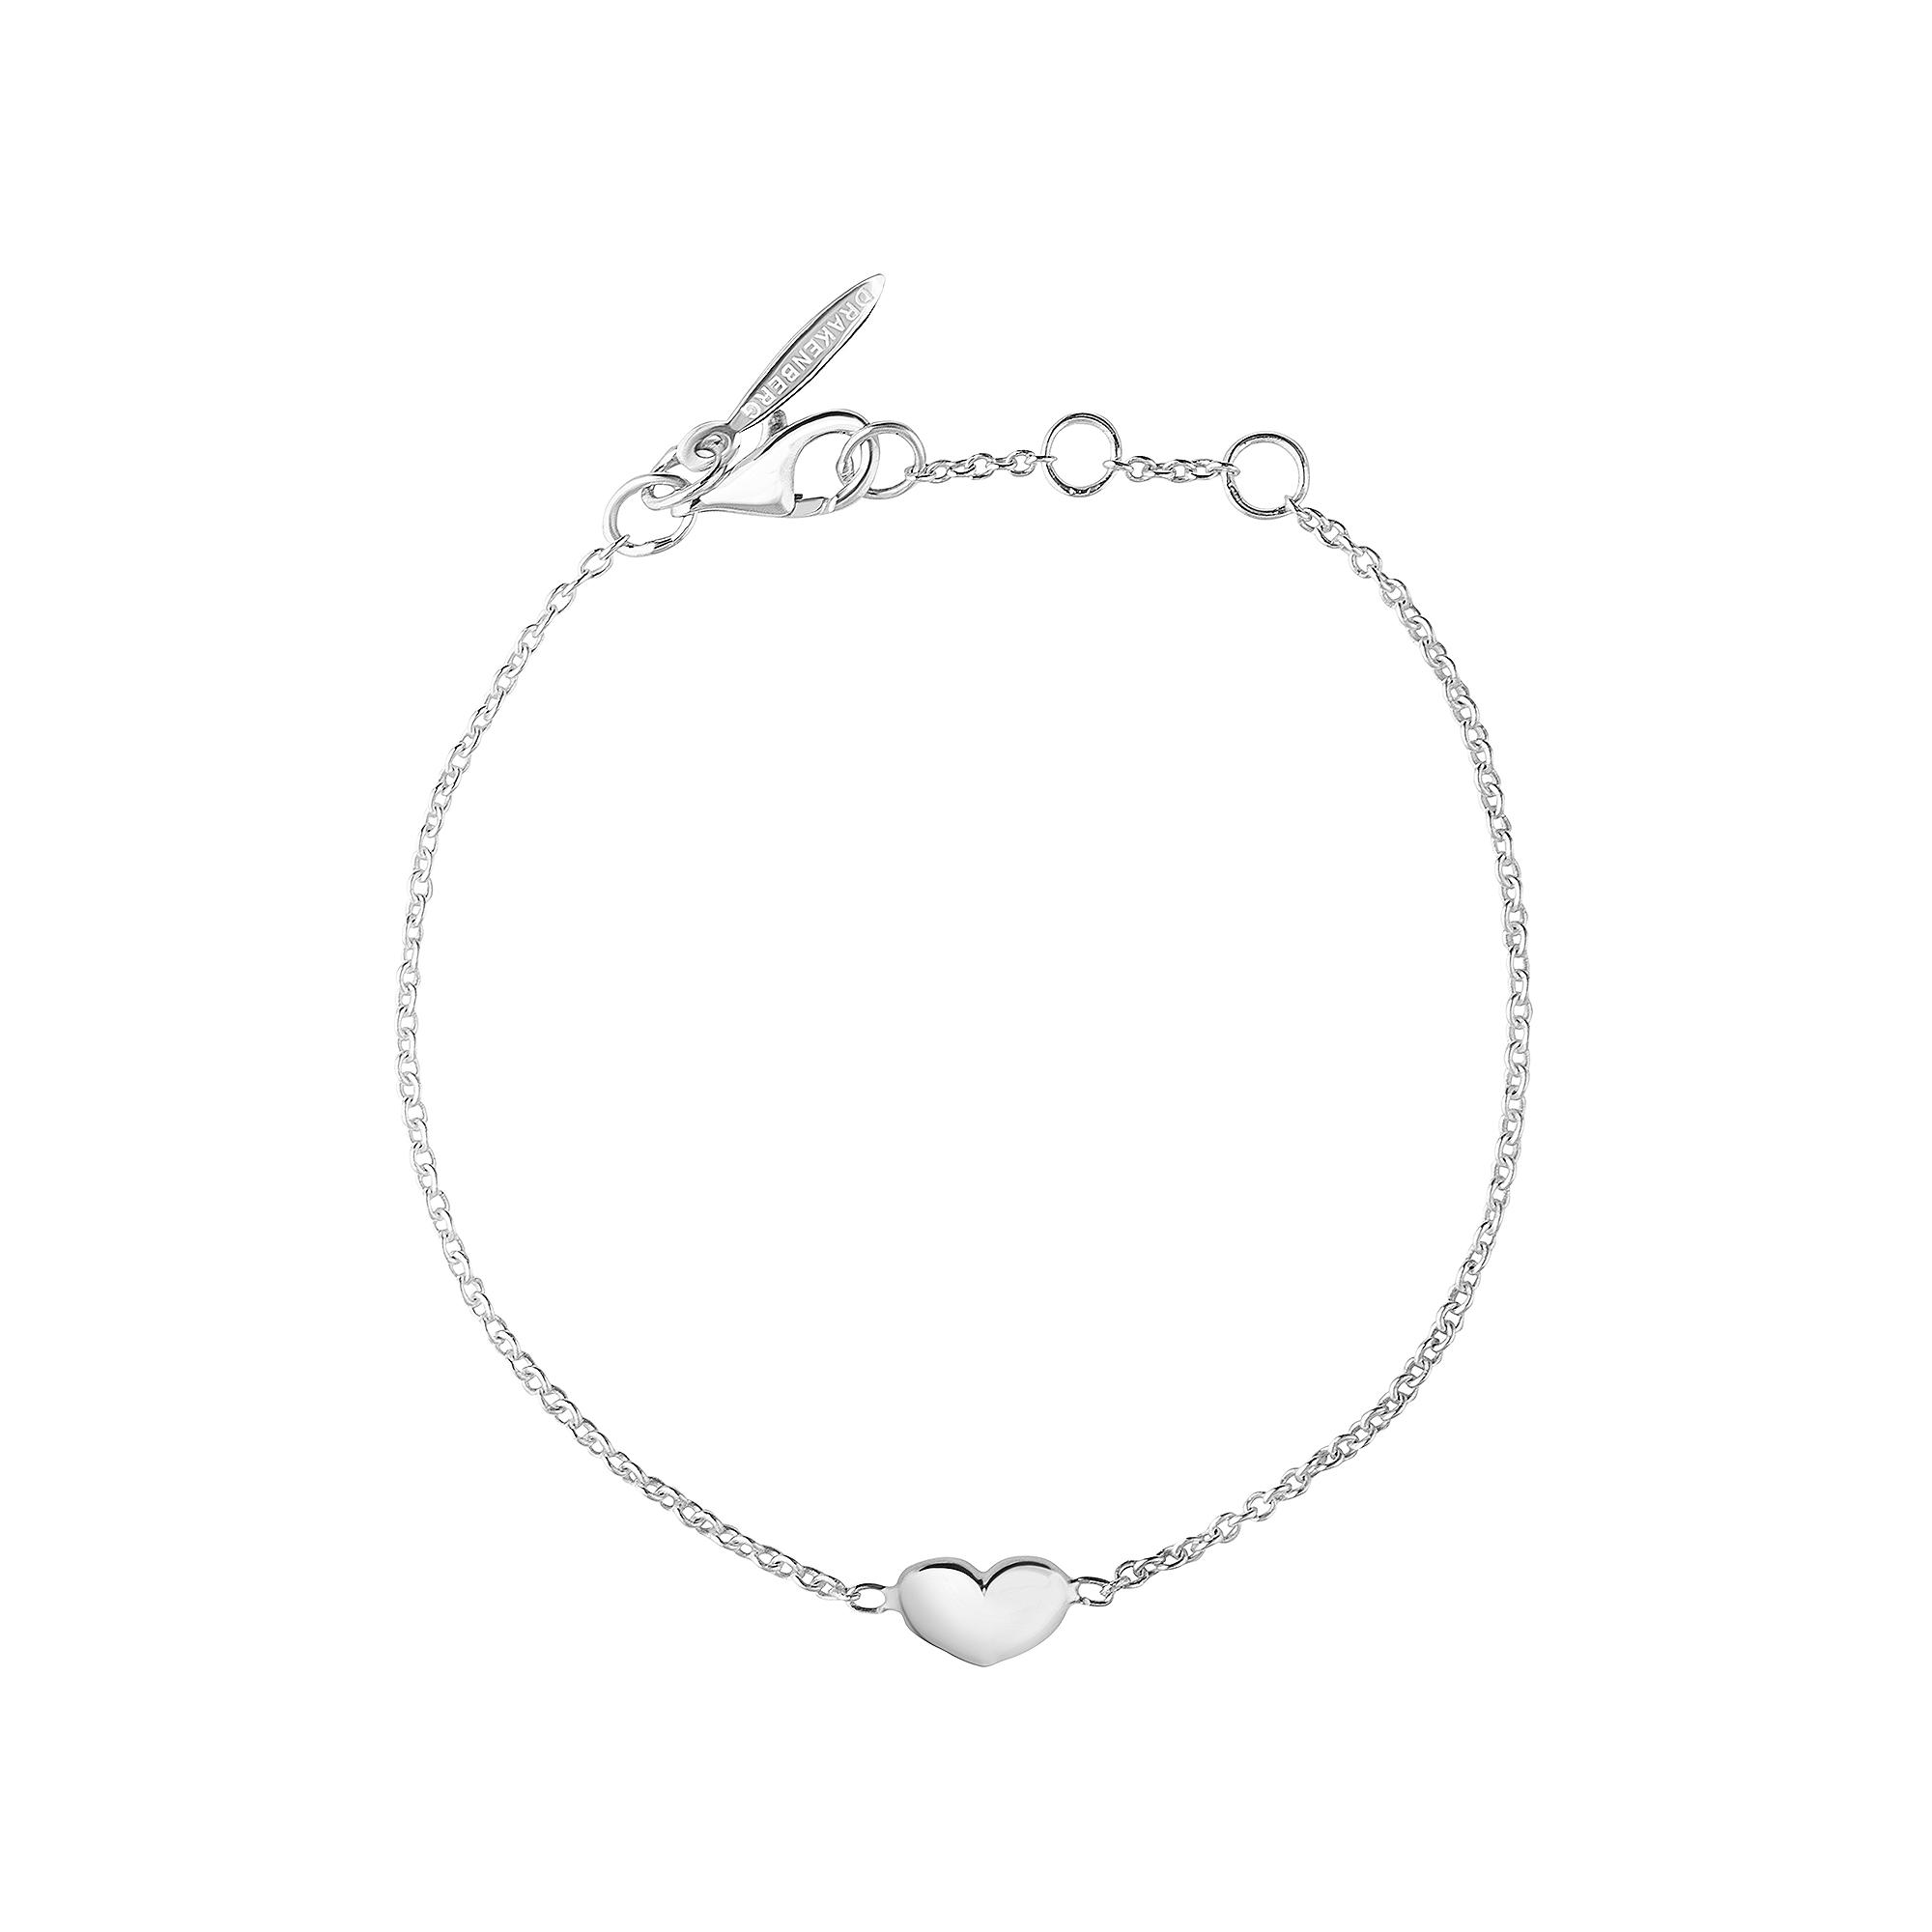 Loving-Heart-medium-single-bracelet-890-SEK